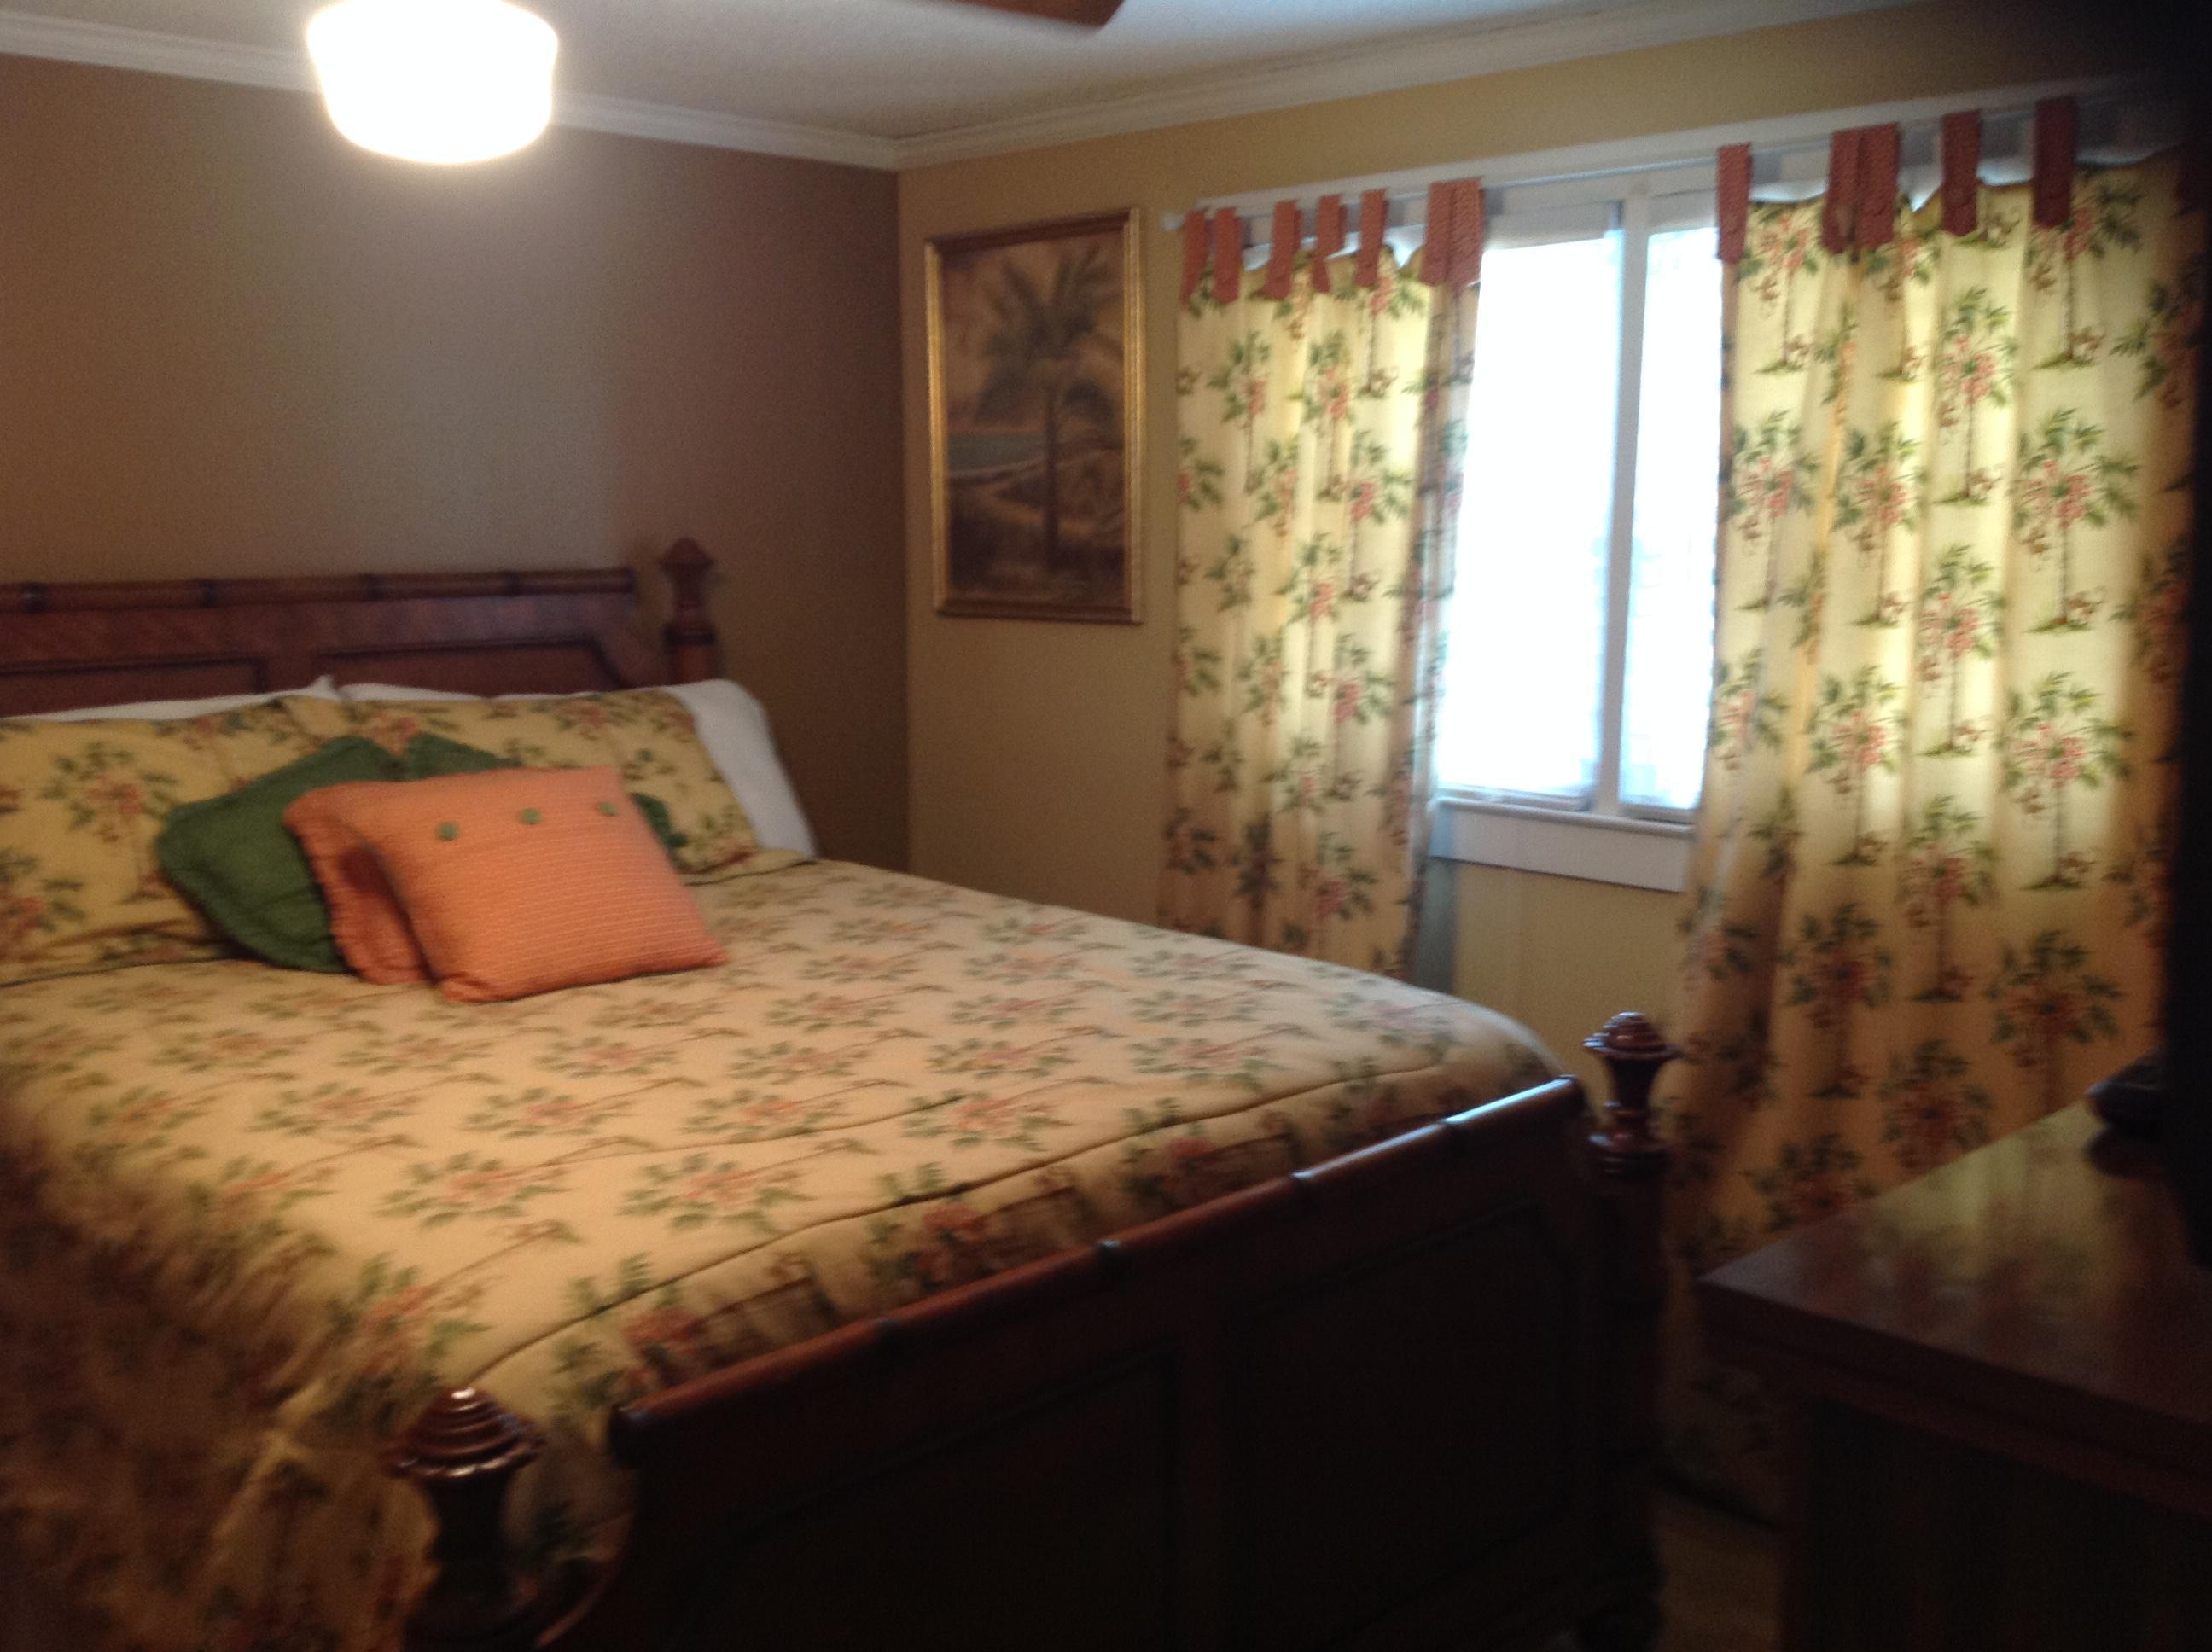 Belvedere II Homes For Sale - 122 Dogwood, Eutawville, SC - 9